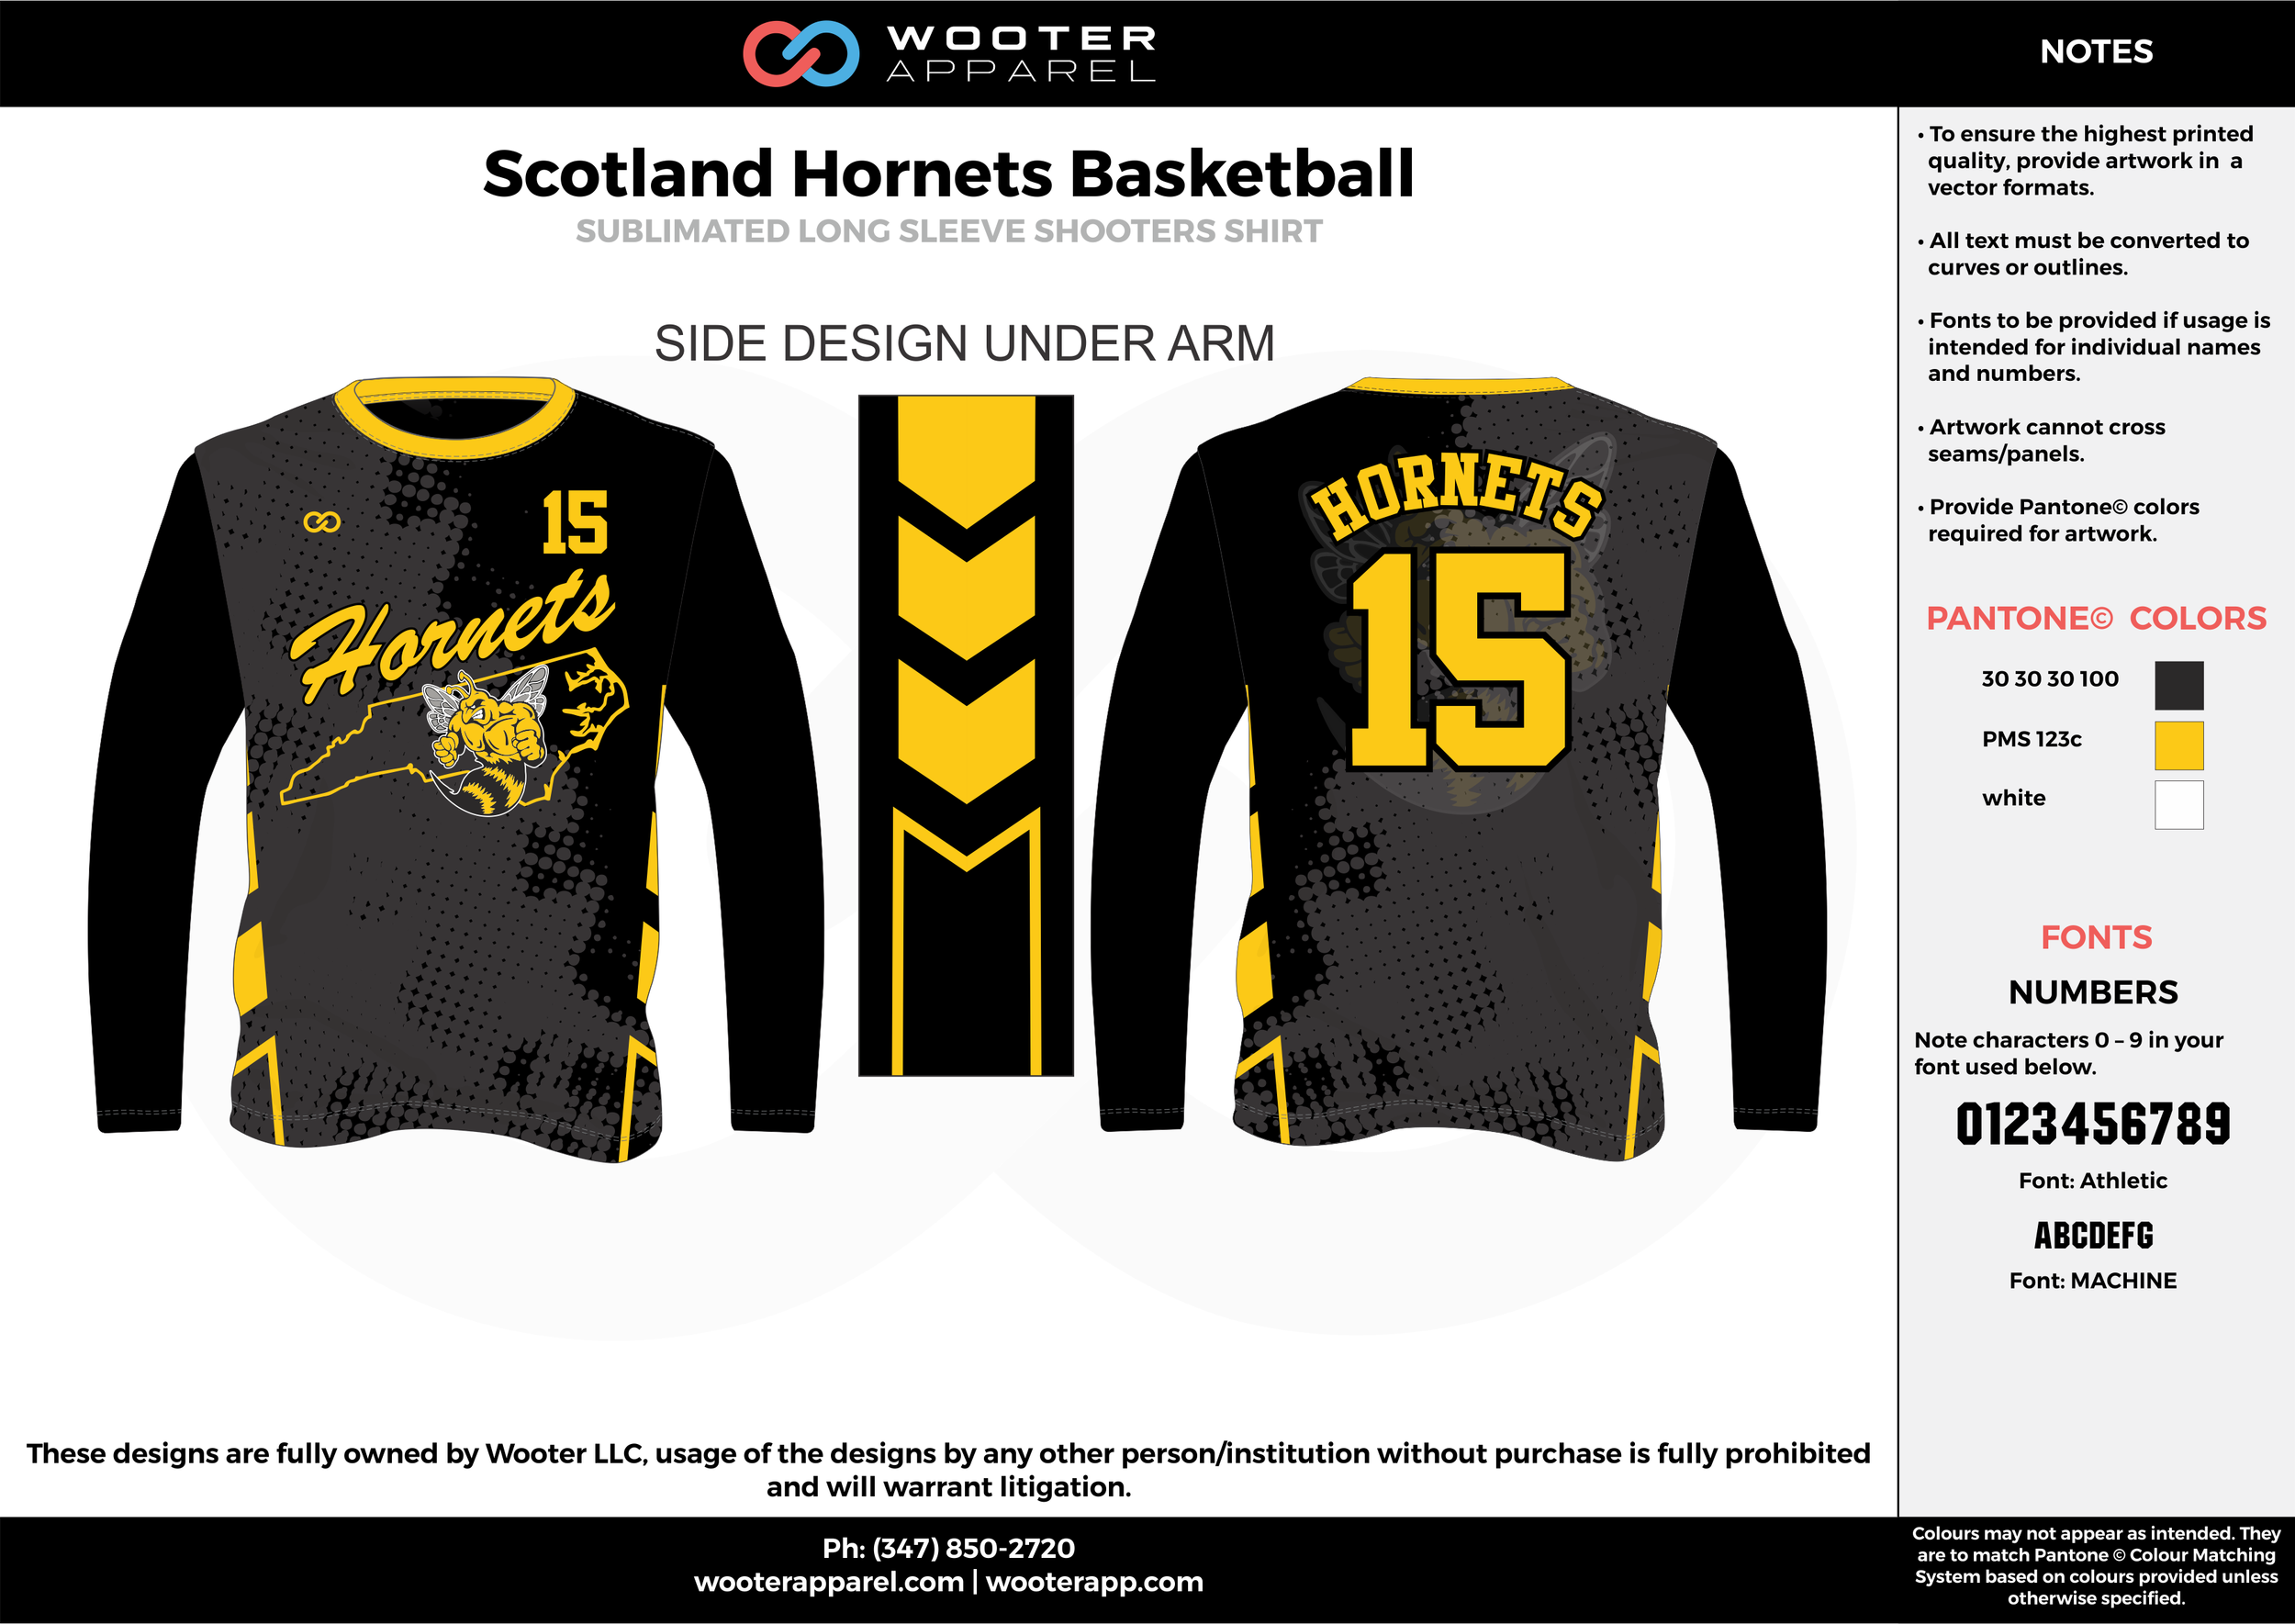 SCOTLAND HORNETS BASKETBALL black yellow white Basketball Long Sleeve Shooting Shirt